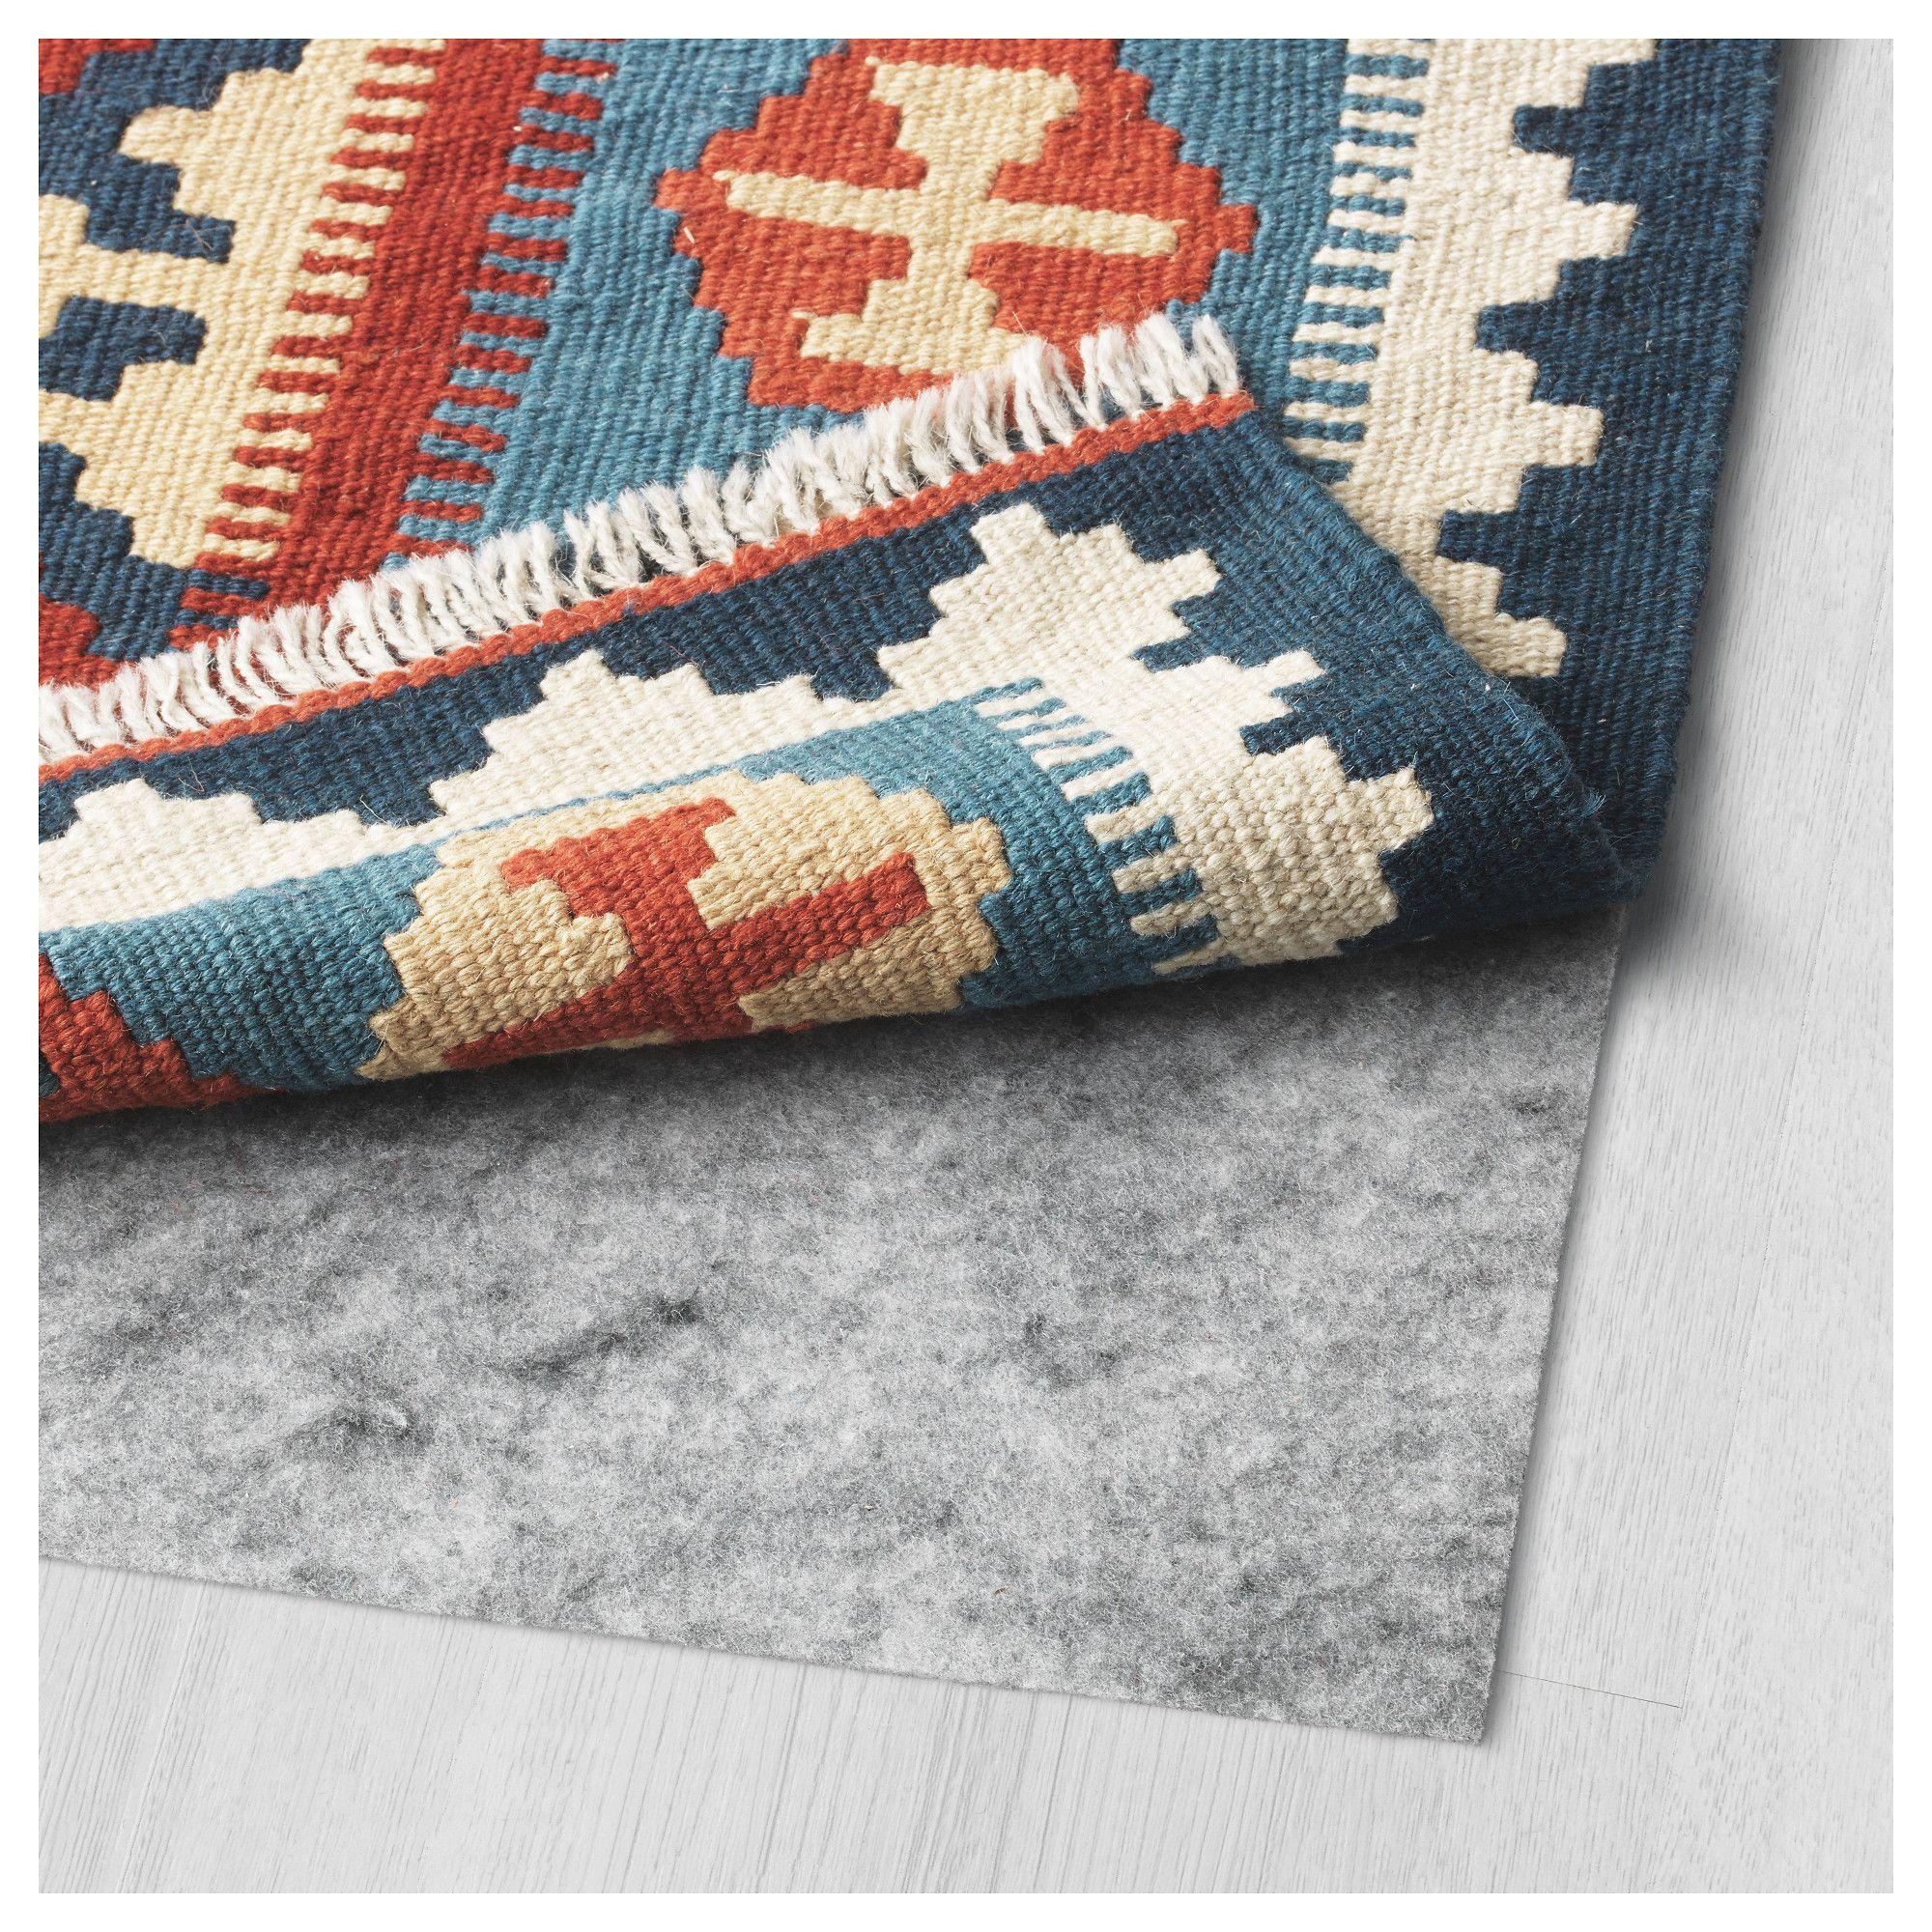 Ikea Kelim persisk kelim gashgai rug flatwoven handmade assorted patterns